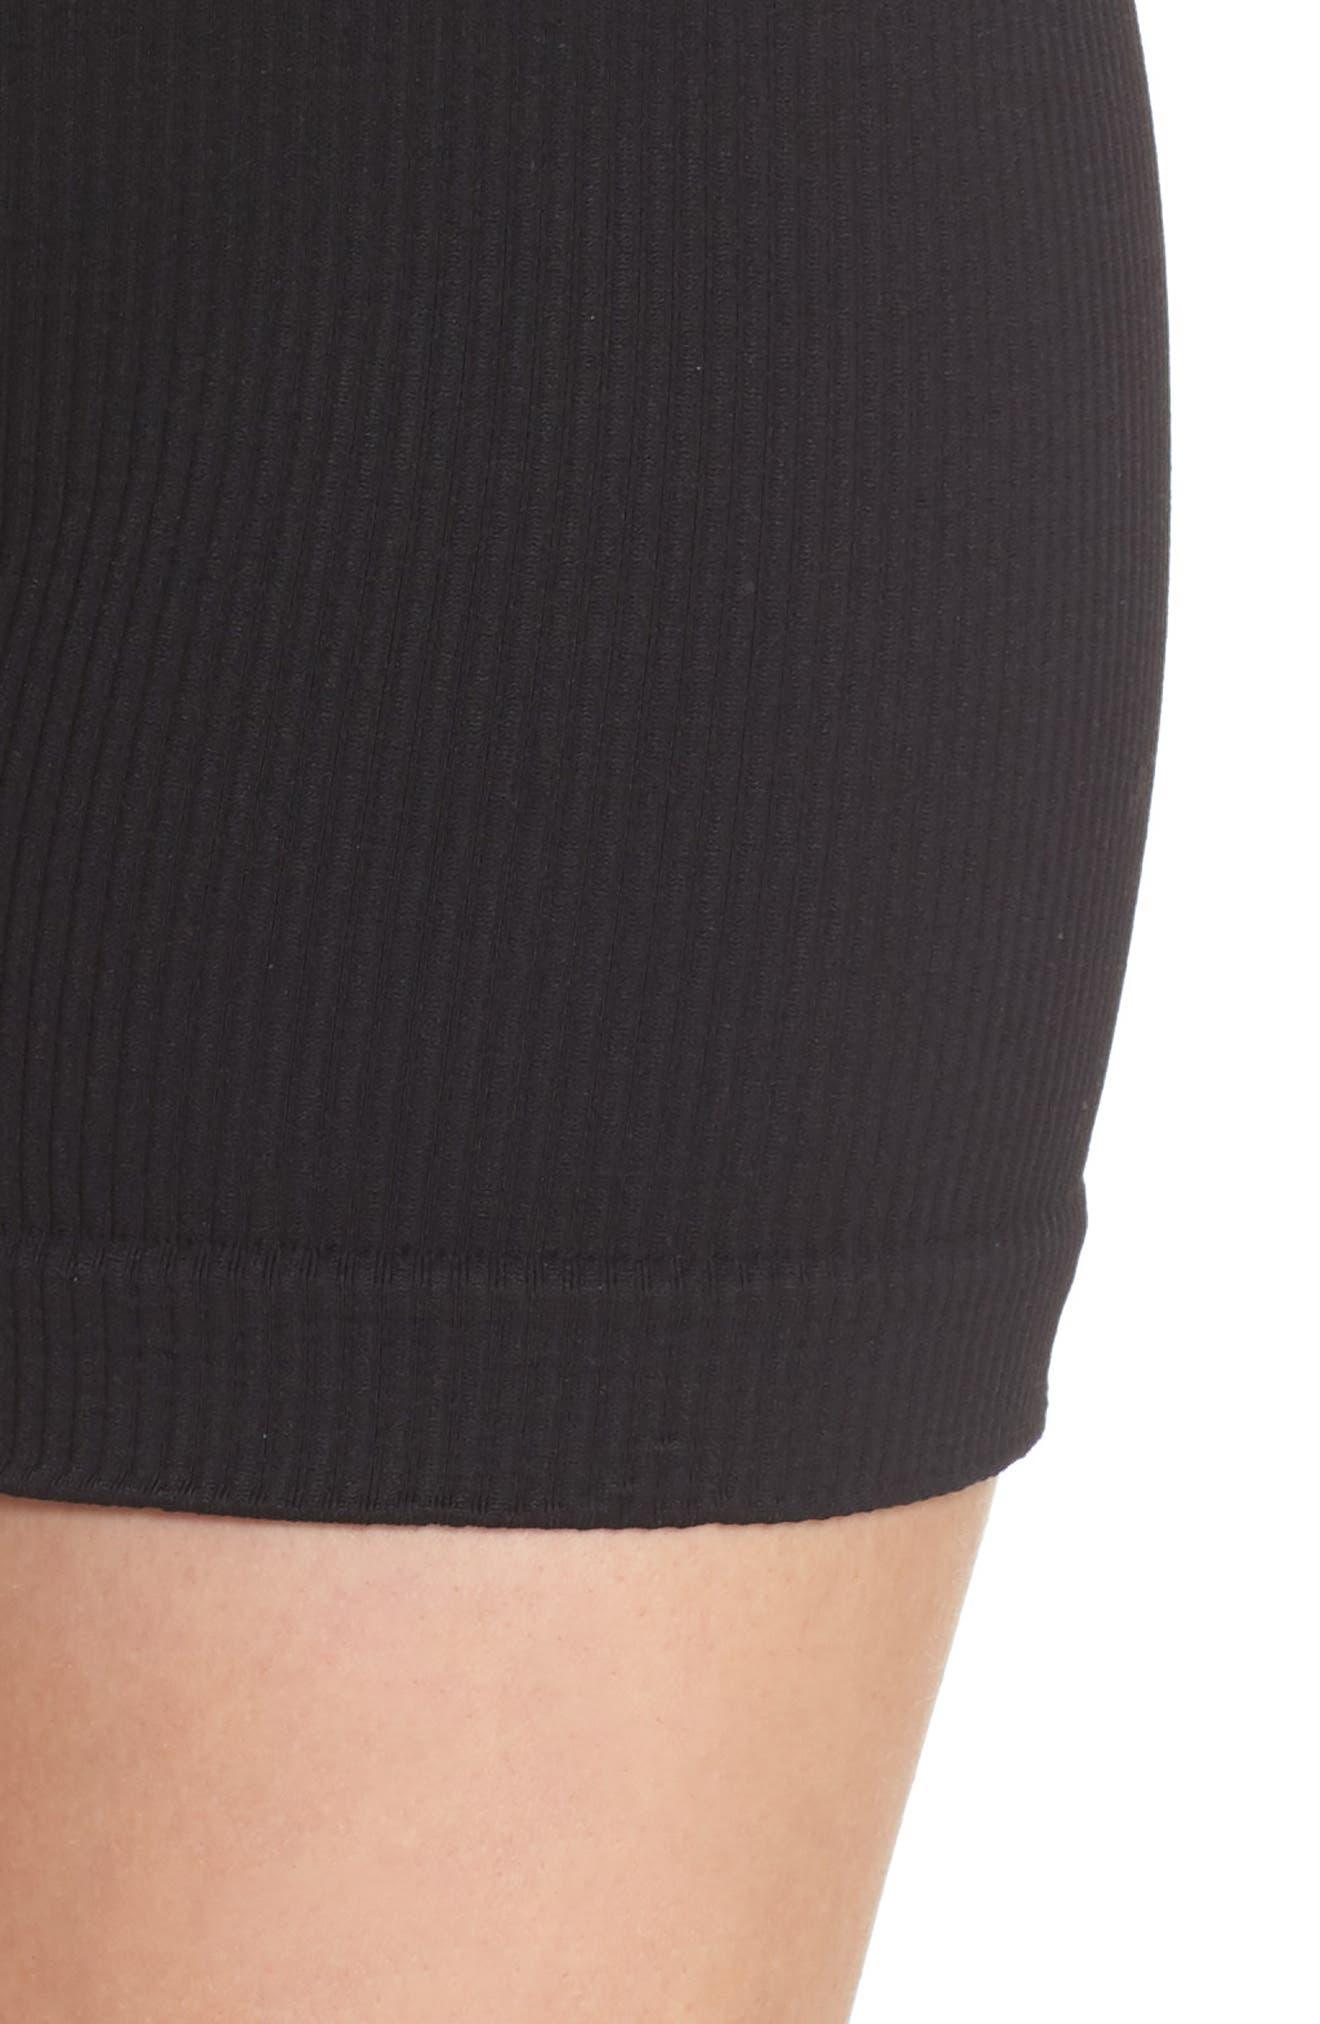 FREE PEOPLE MOVEMENT, Seamless Shorts, Alternate thumbnail 5, color, BLACK